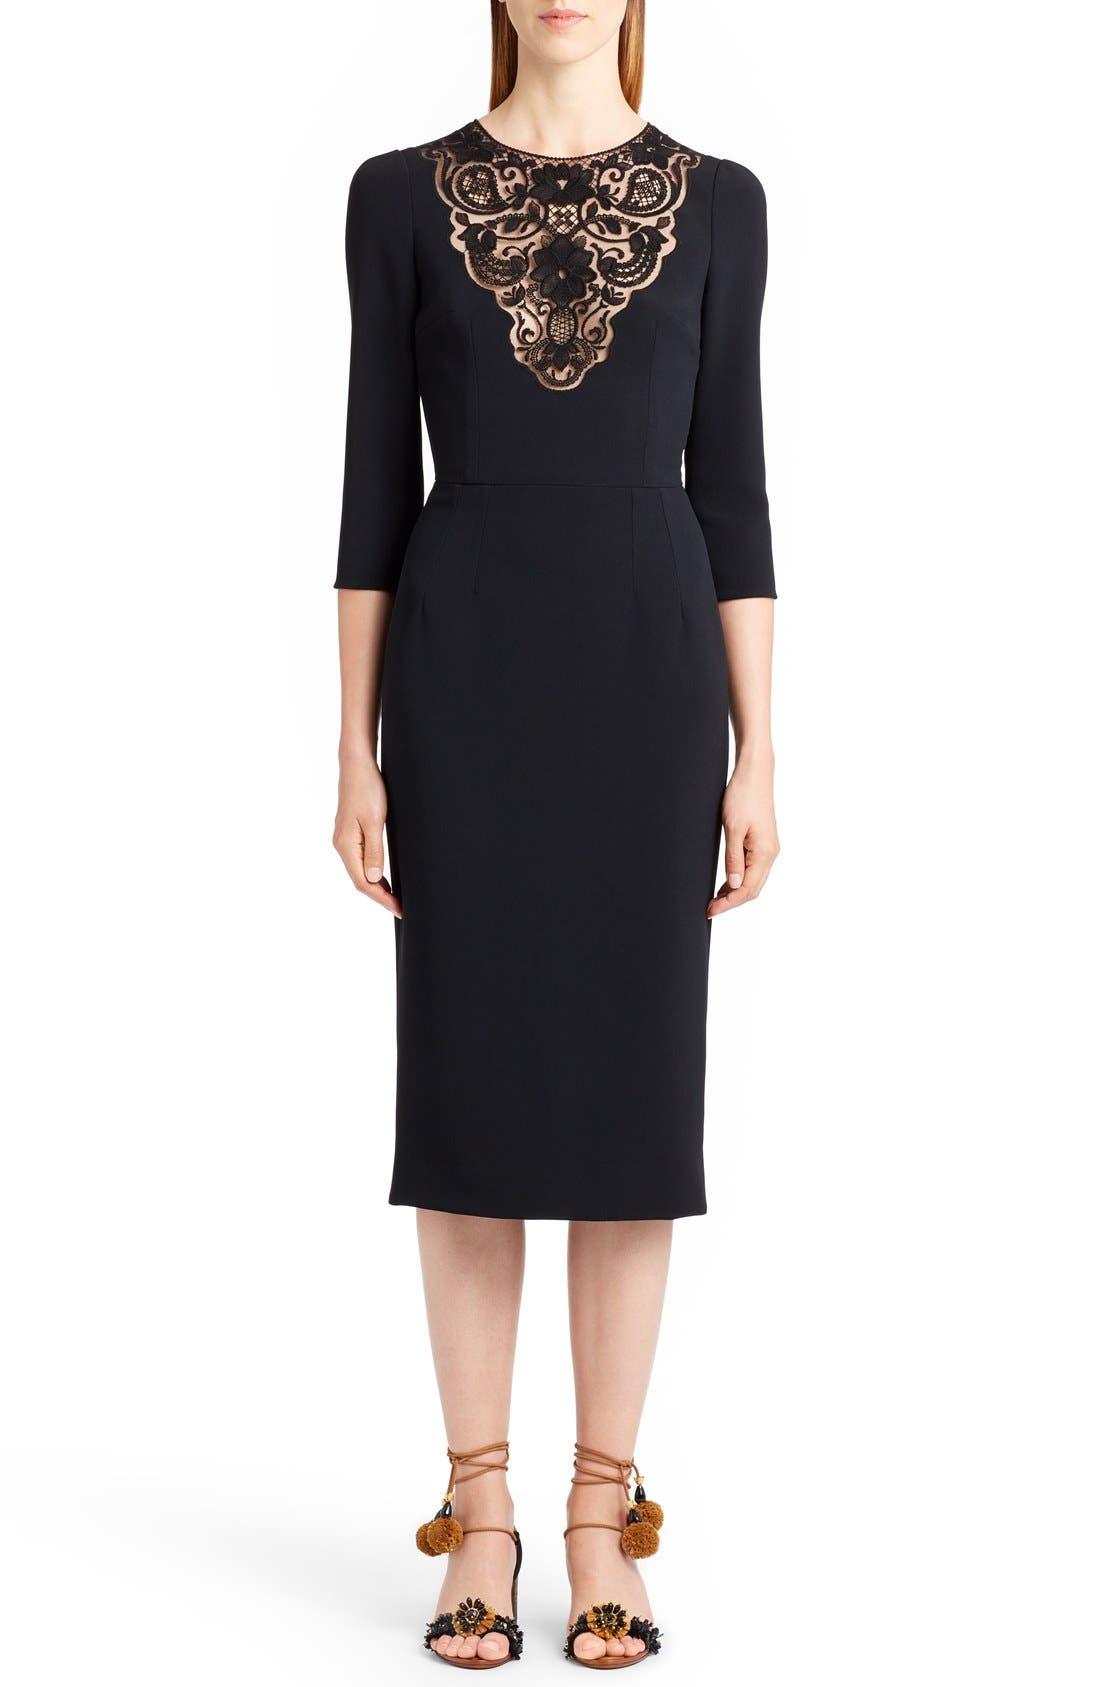 Dolce&Gabbana Lace Inset Sheath Dress